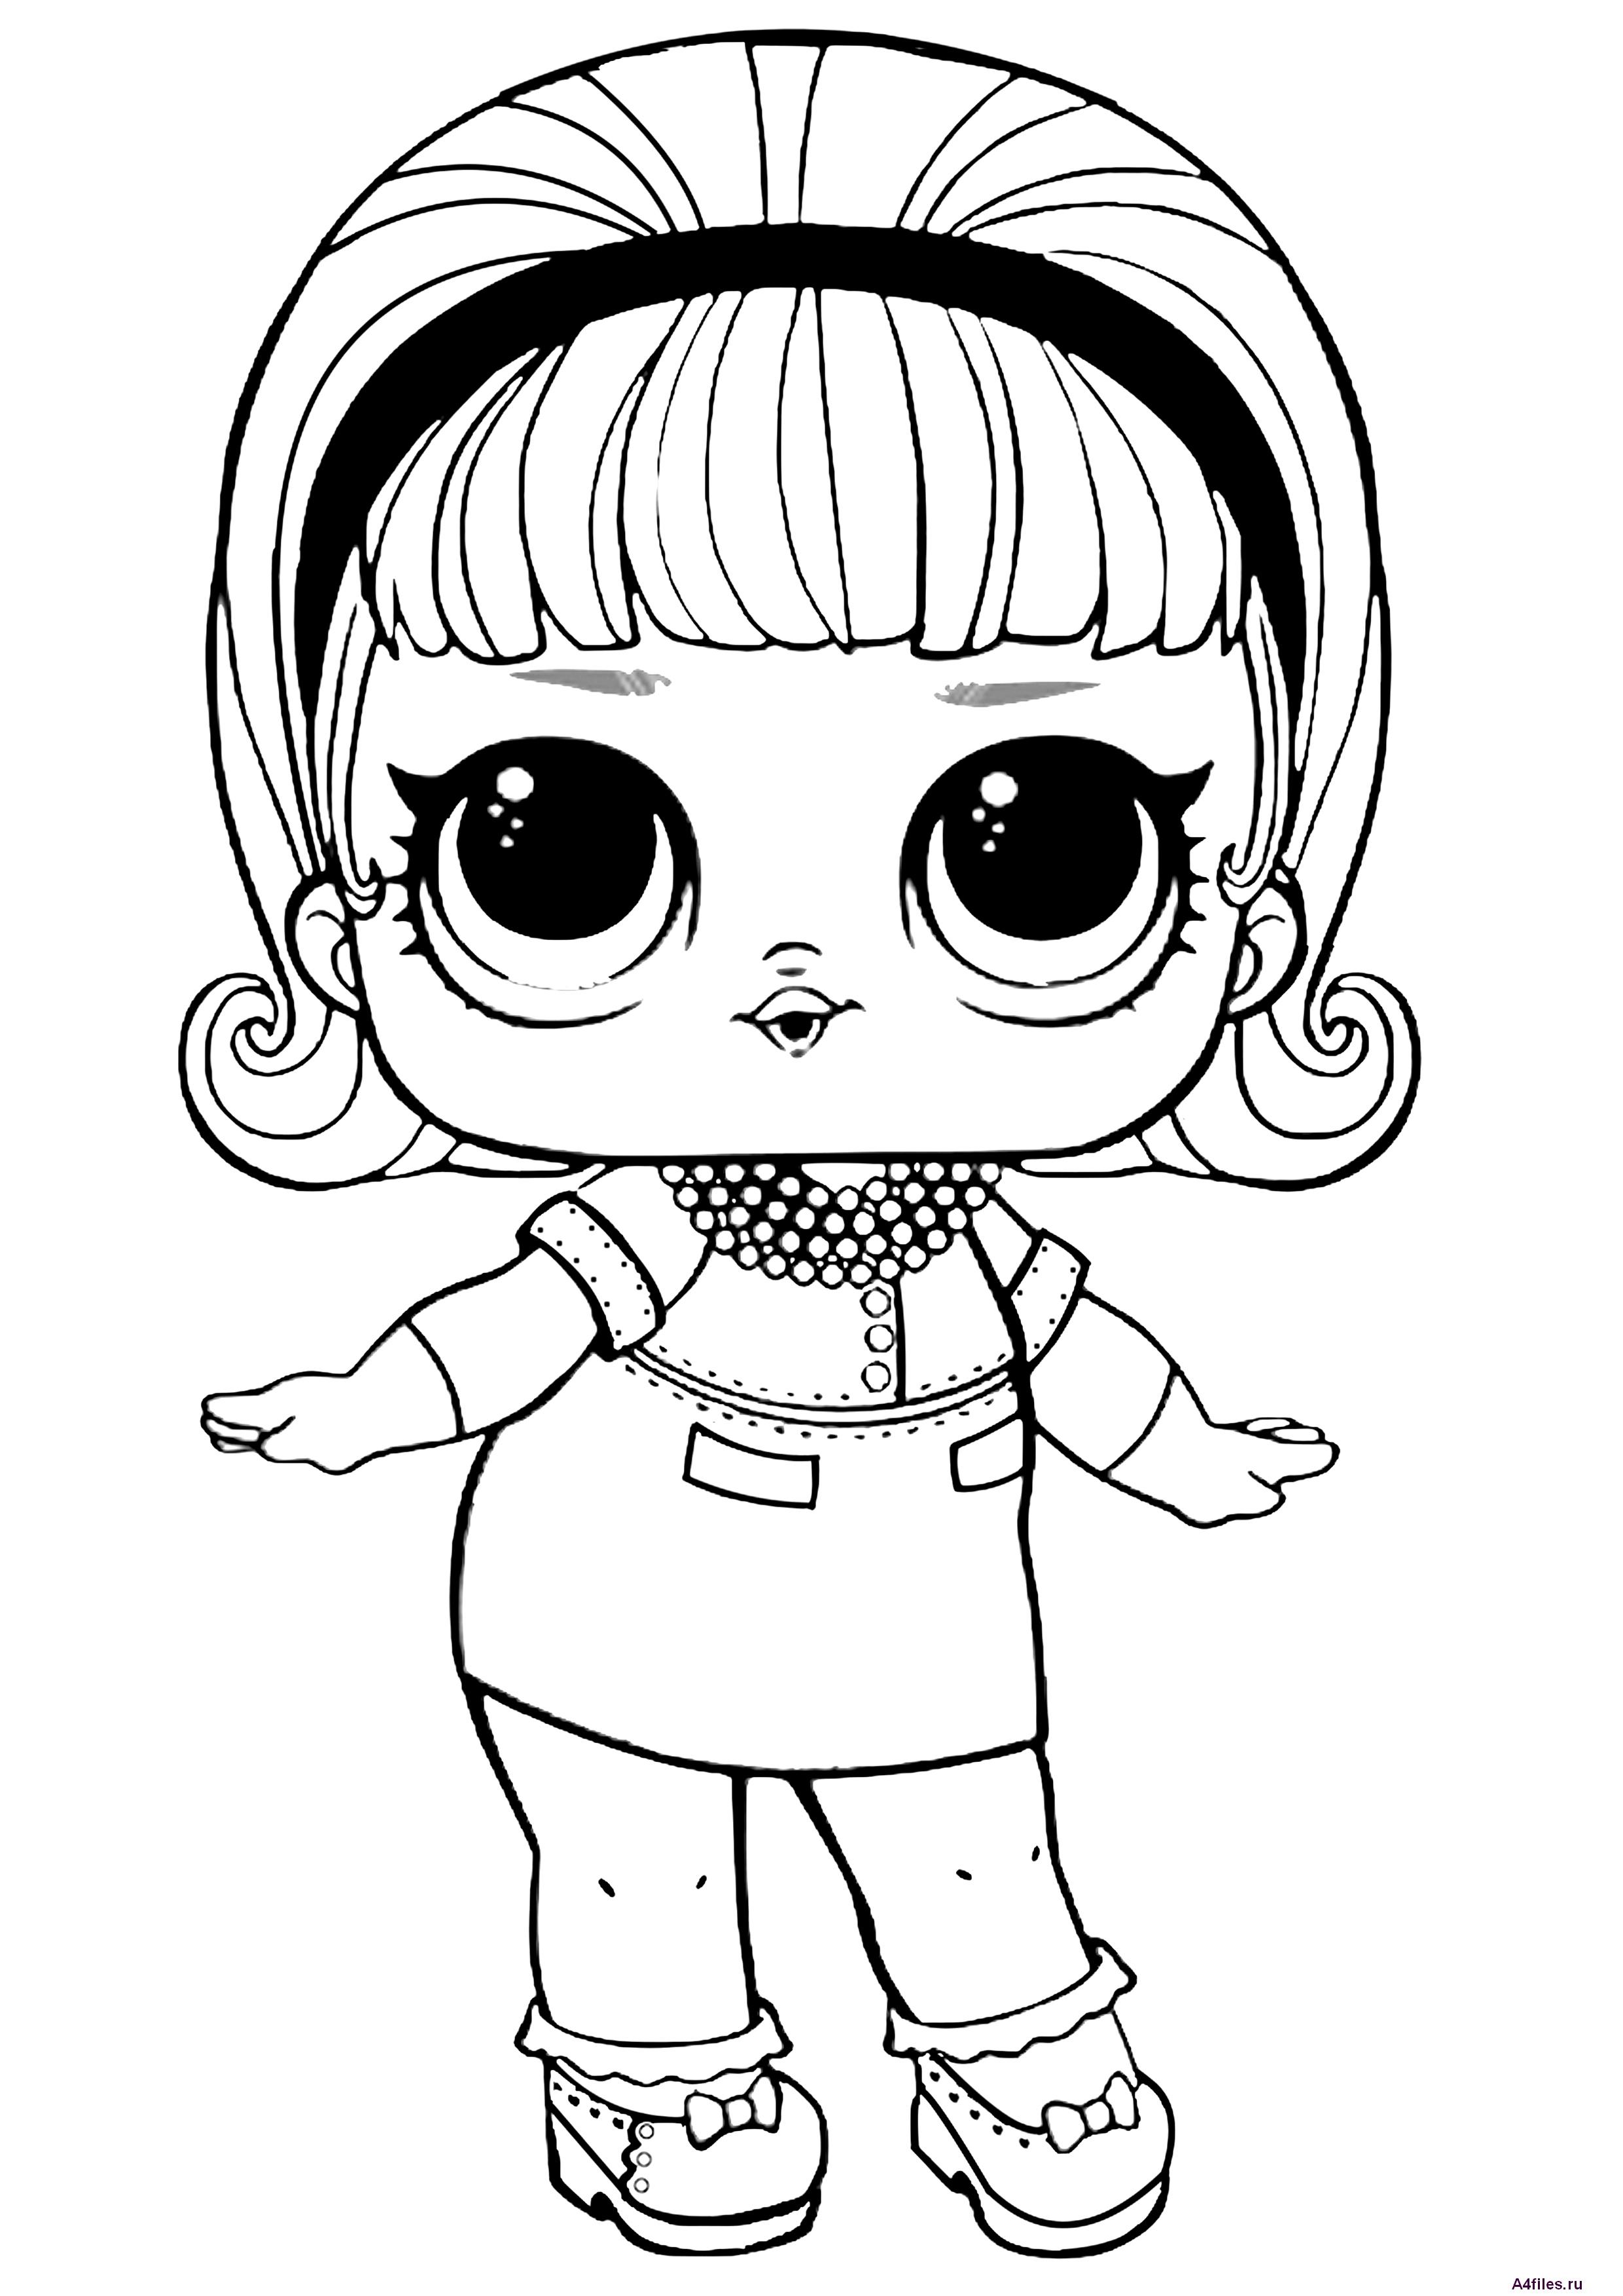 "Раскраска ""Кукла ЛОЛ"" 3 серия - Раскраски А4 формата для ..."